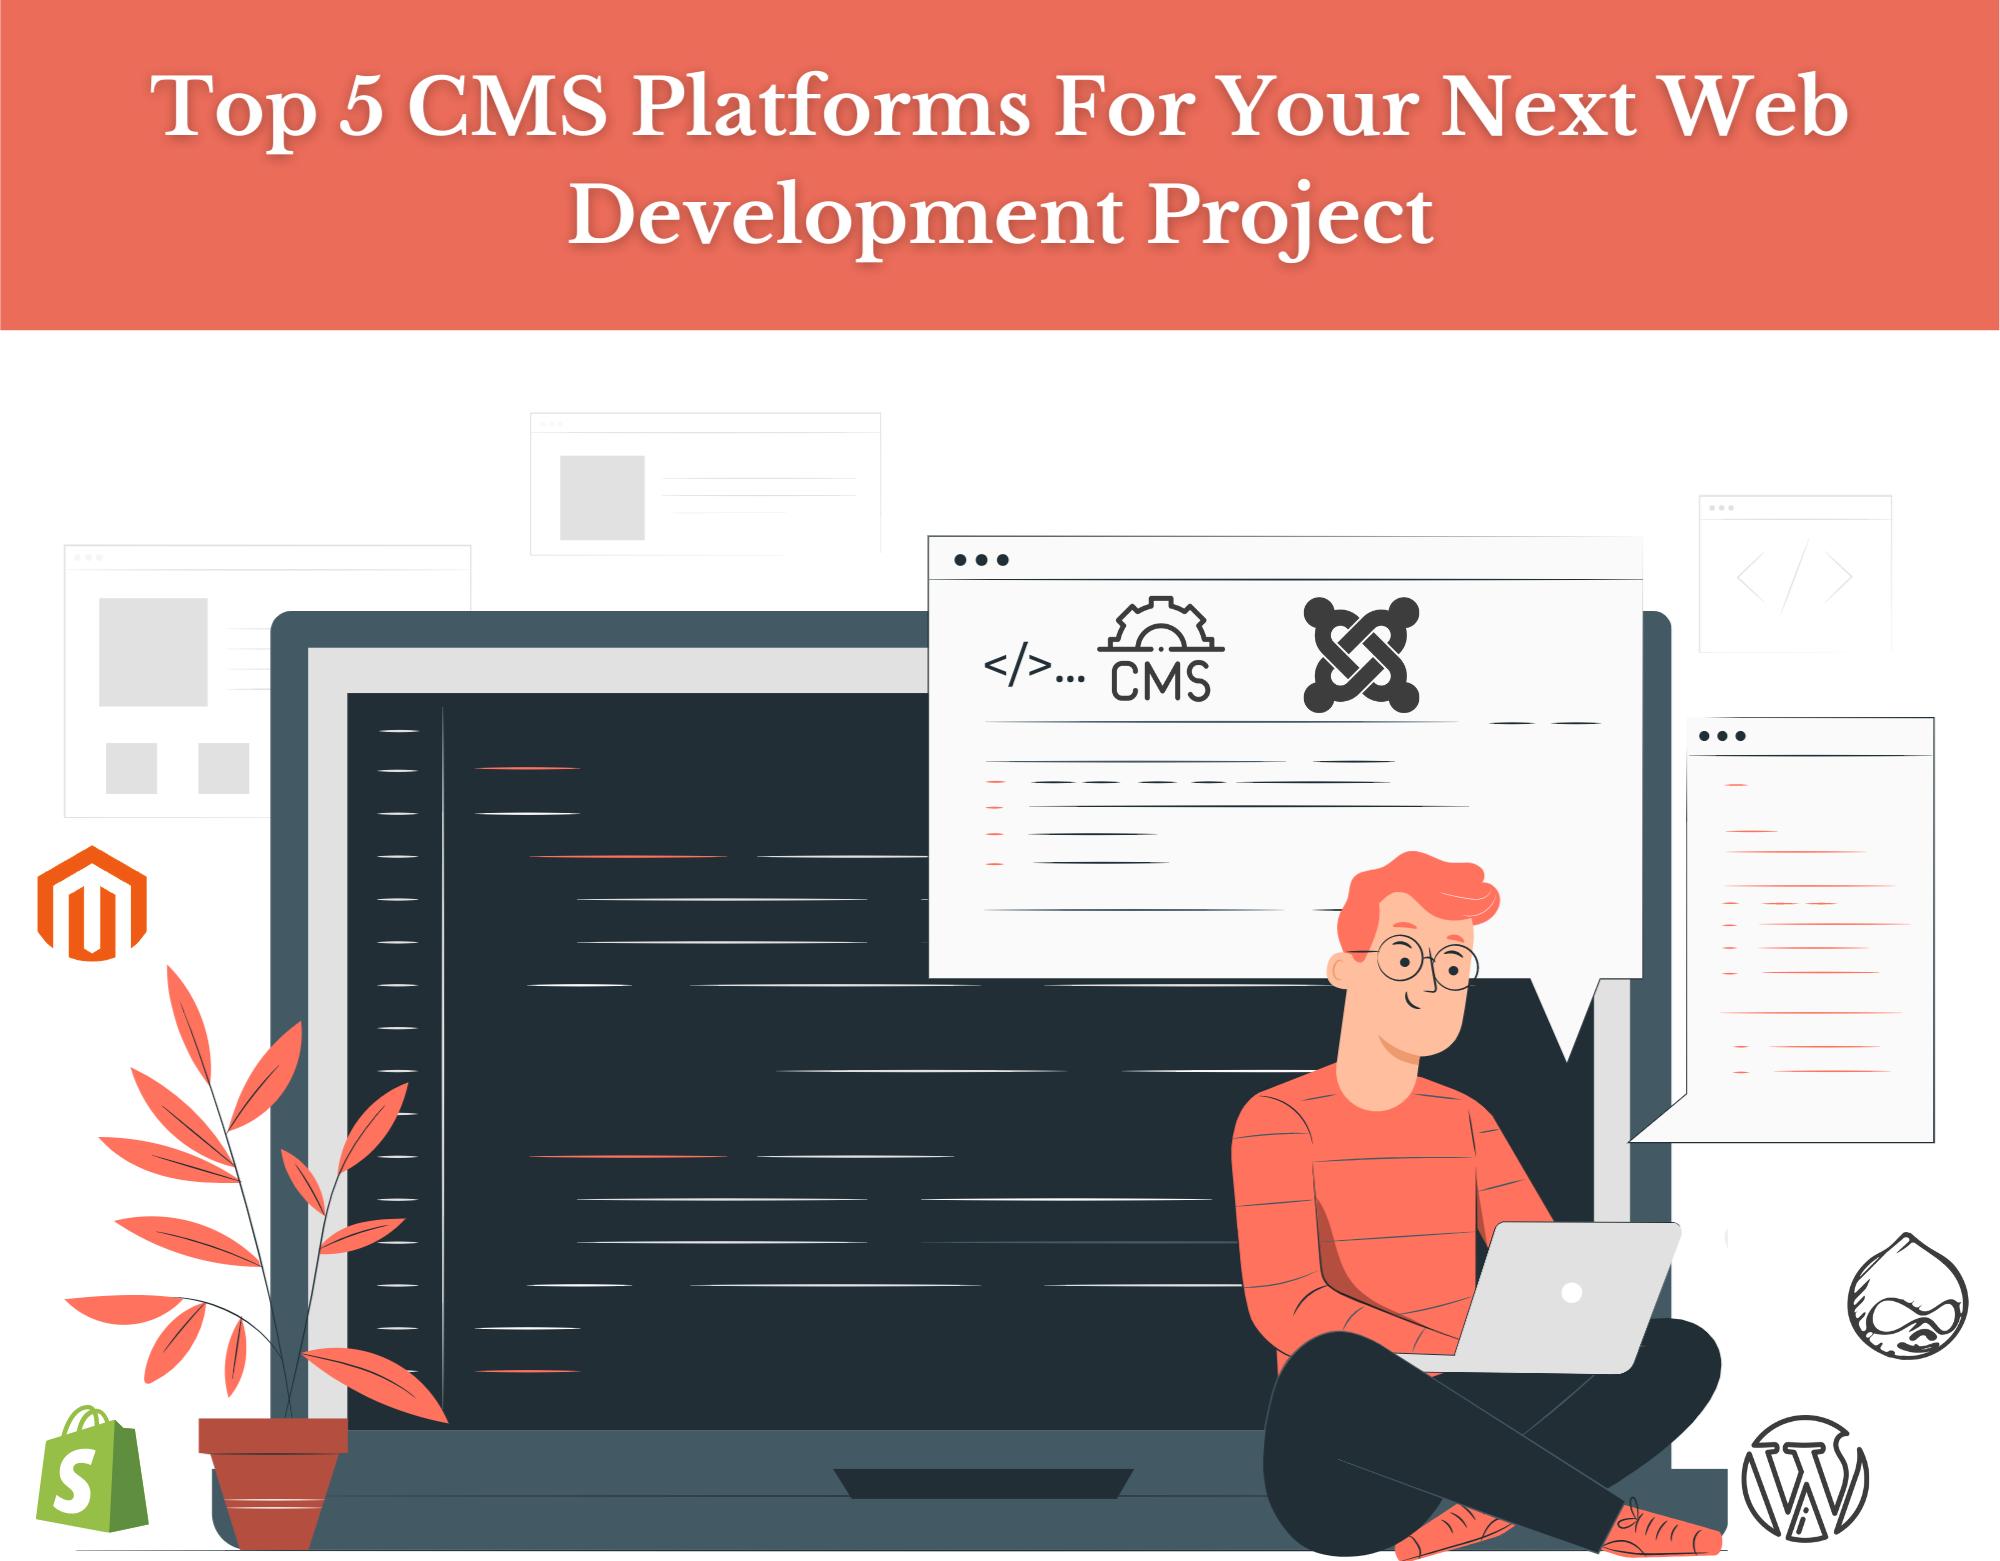 Top 5 CMS Platforms For Your Next Web Development Project